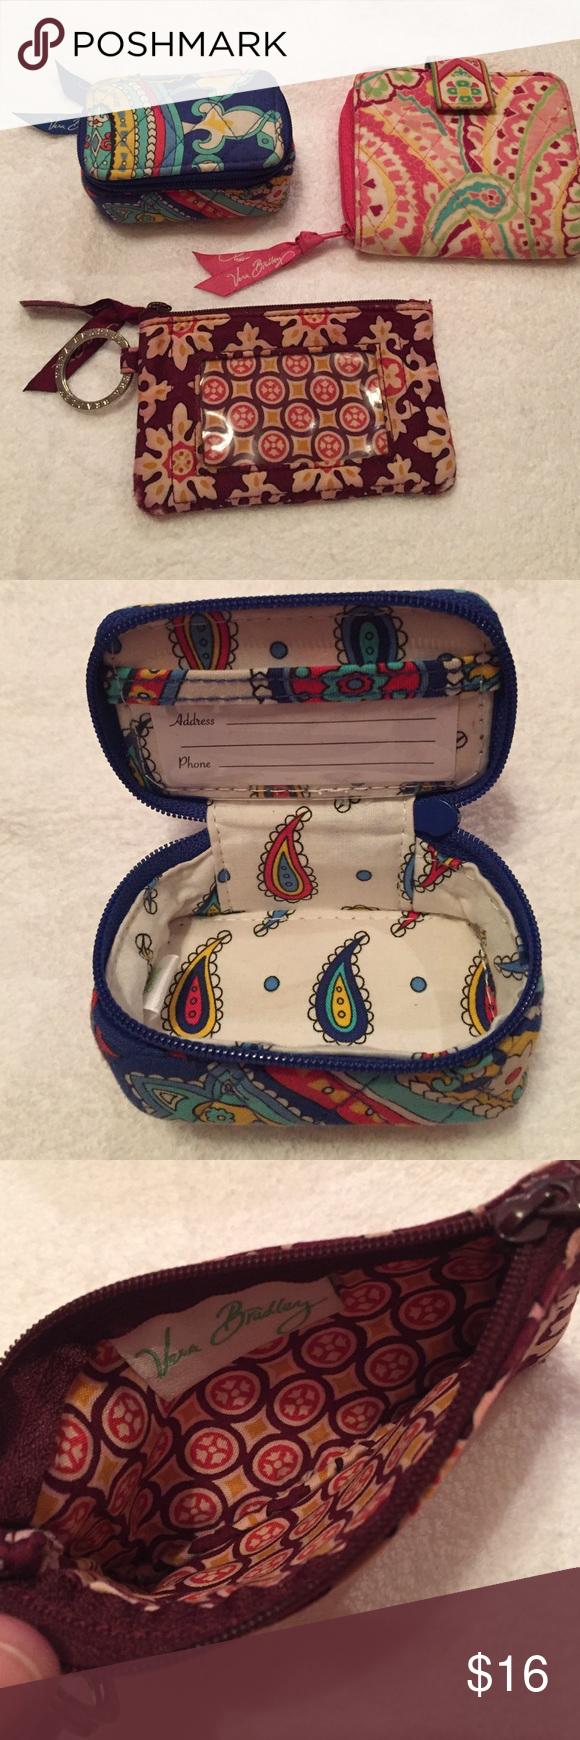 Bundle Vera Bradley Waller smal bags and Vera Bradley Bags Wallets